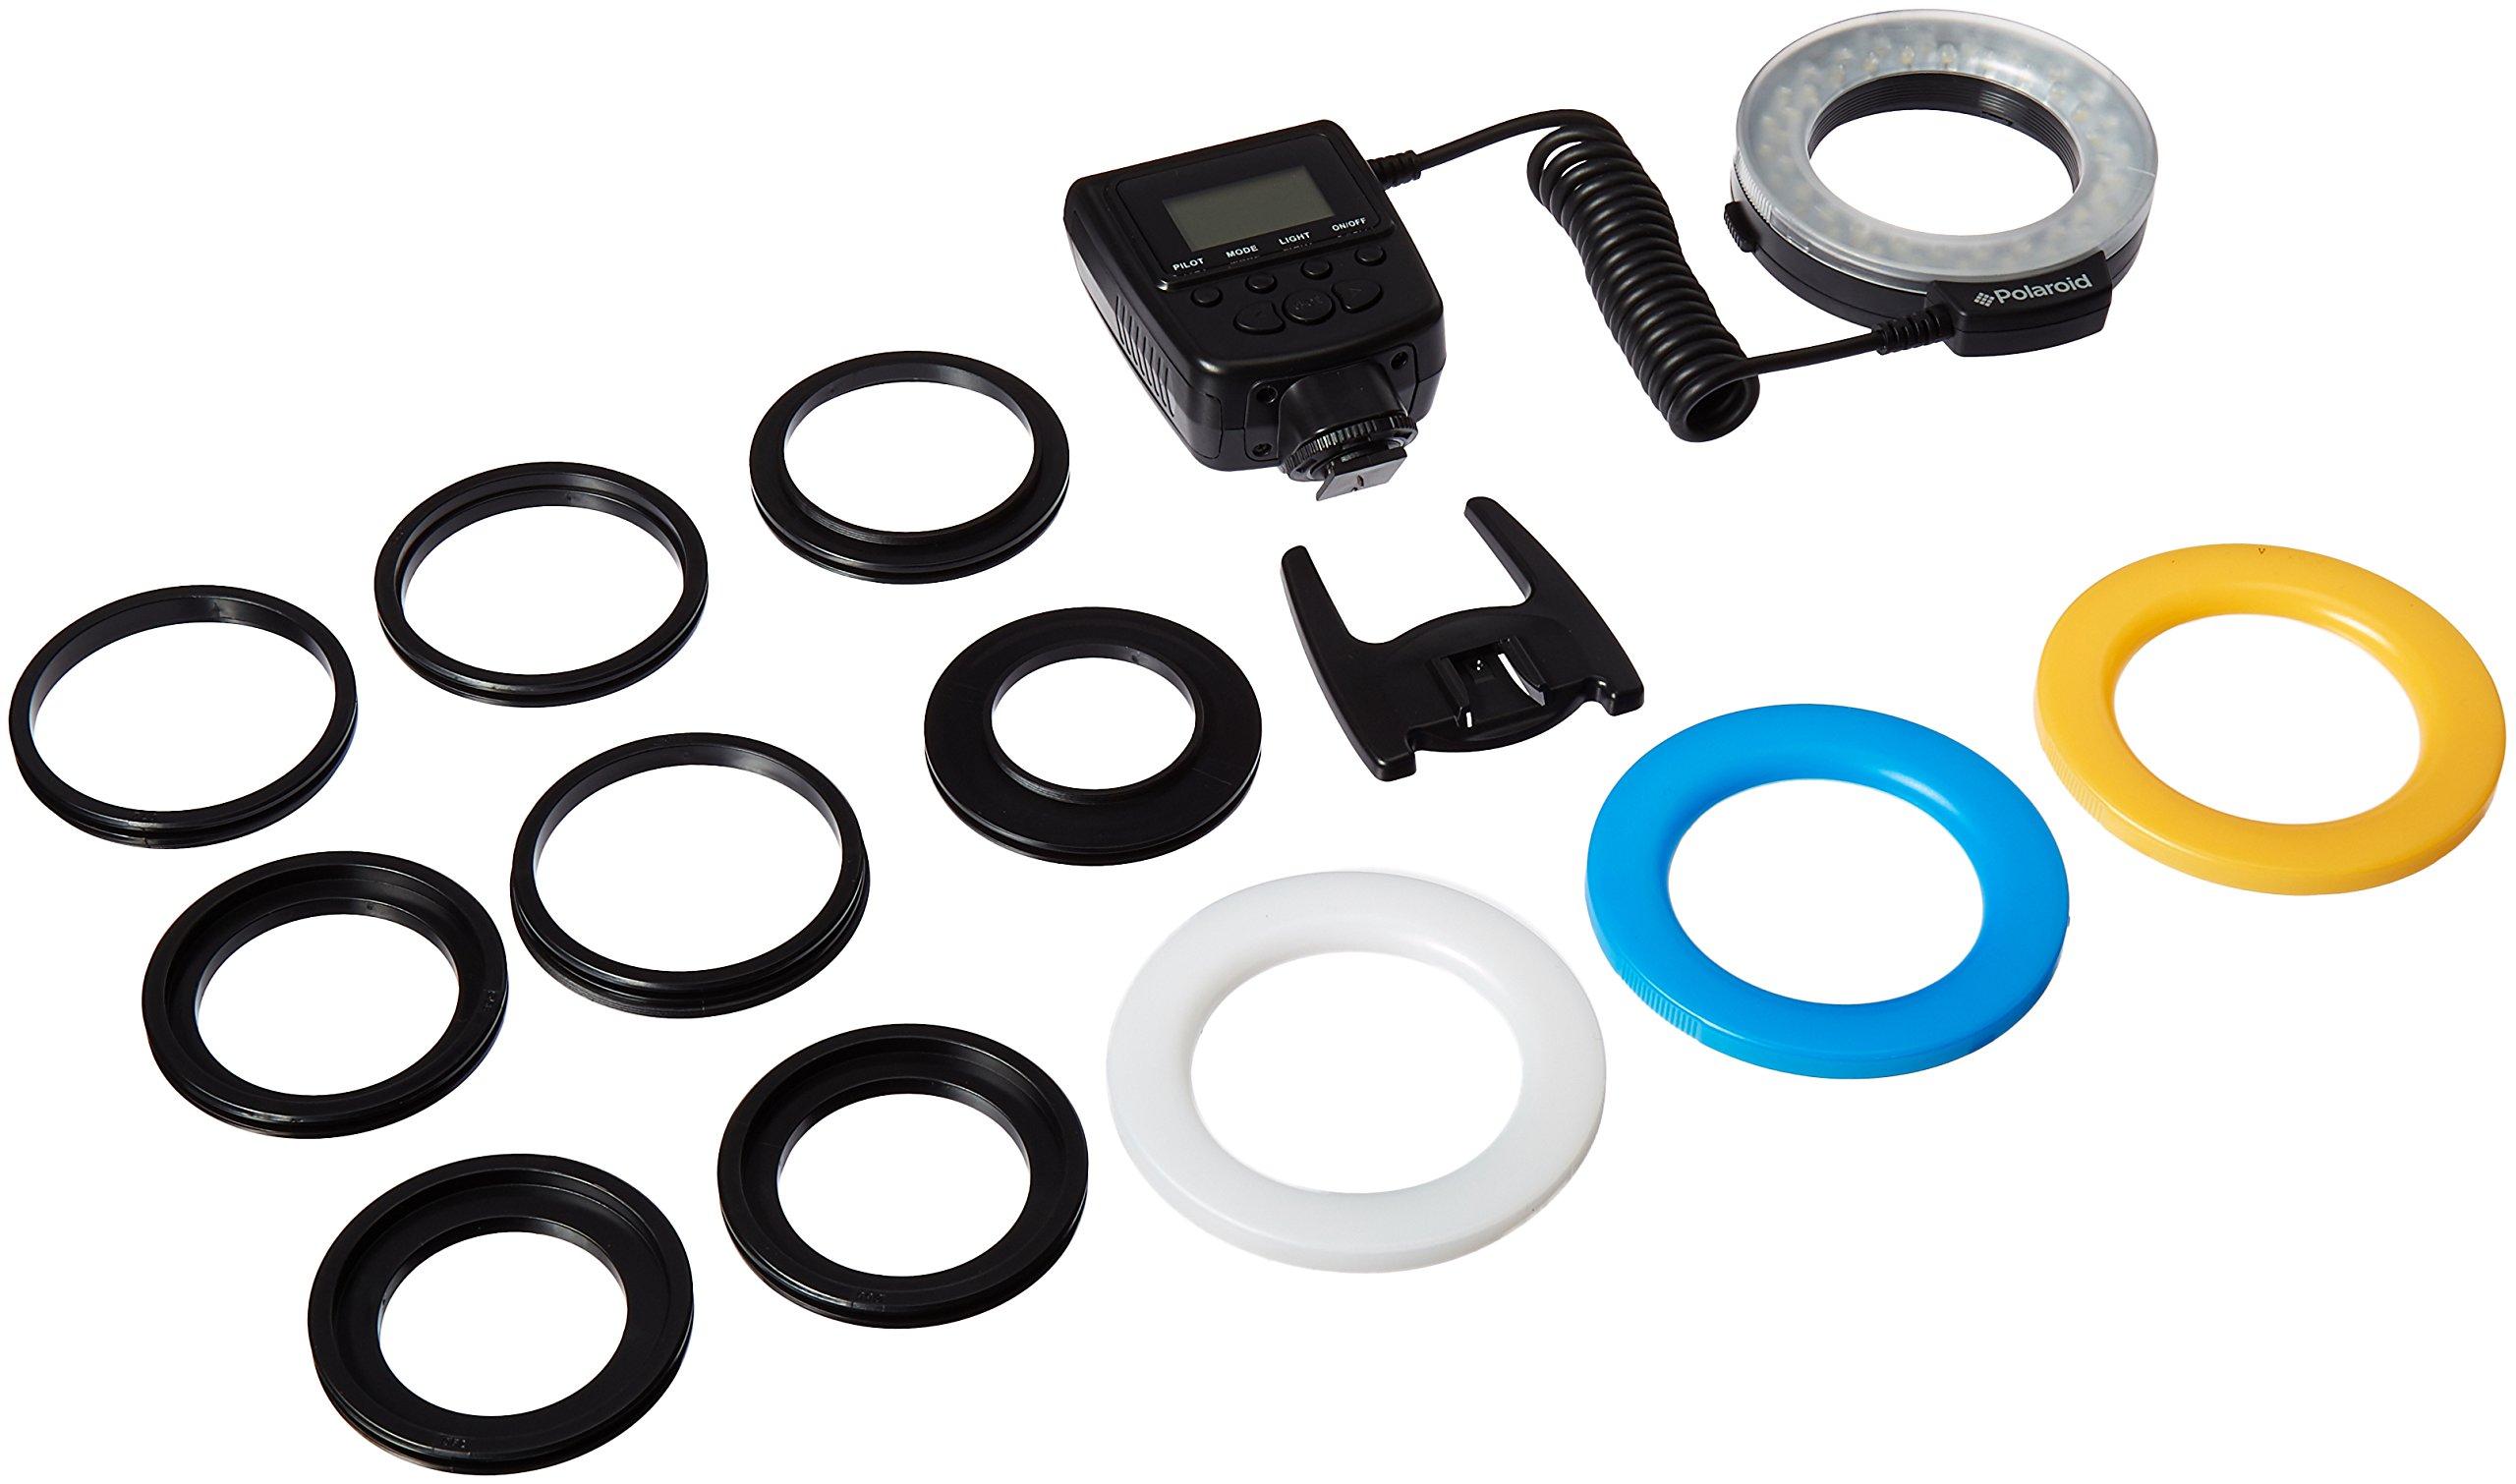 Polaroid 48 Macro LED Ring Flash & Light Includes 4 Diffusers (Clear, Warming, Blue, White) For Canon, Nikon, Panasonic, Olympus, Pentax SLR Camera